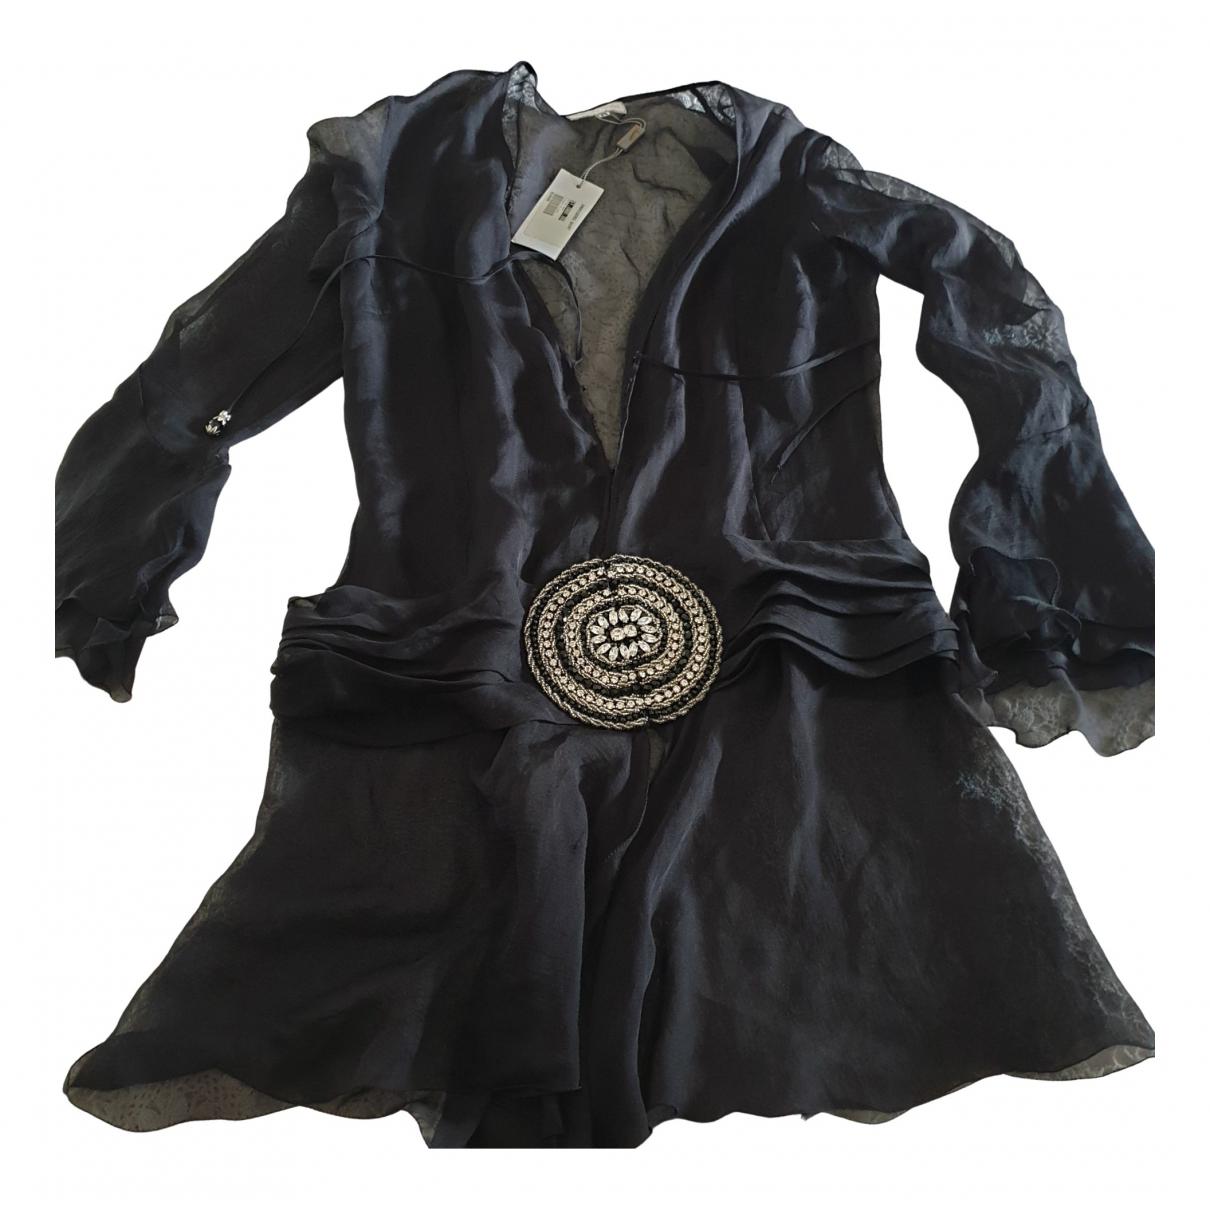 Vestido de Encaje Non Signe / Unsigned